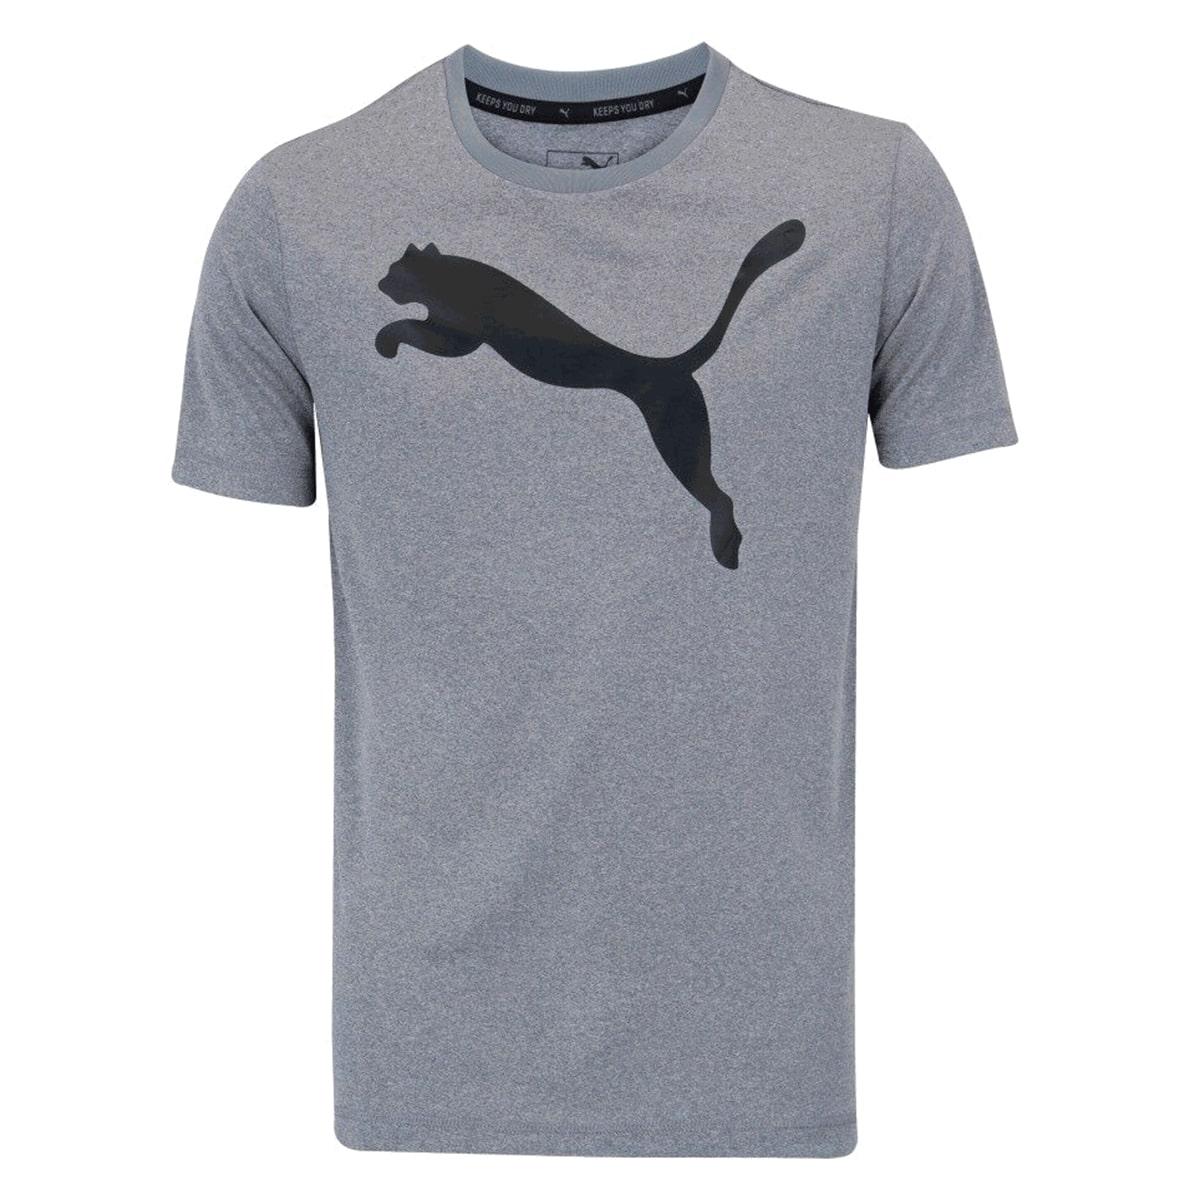 Camiseta Puma Ess Active Big Logo Masculino Cinza